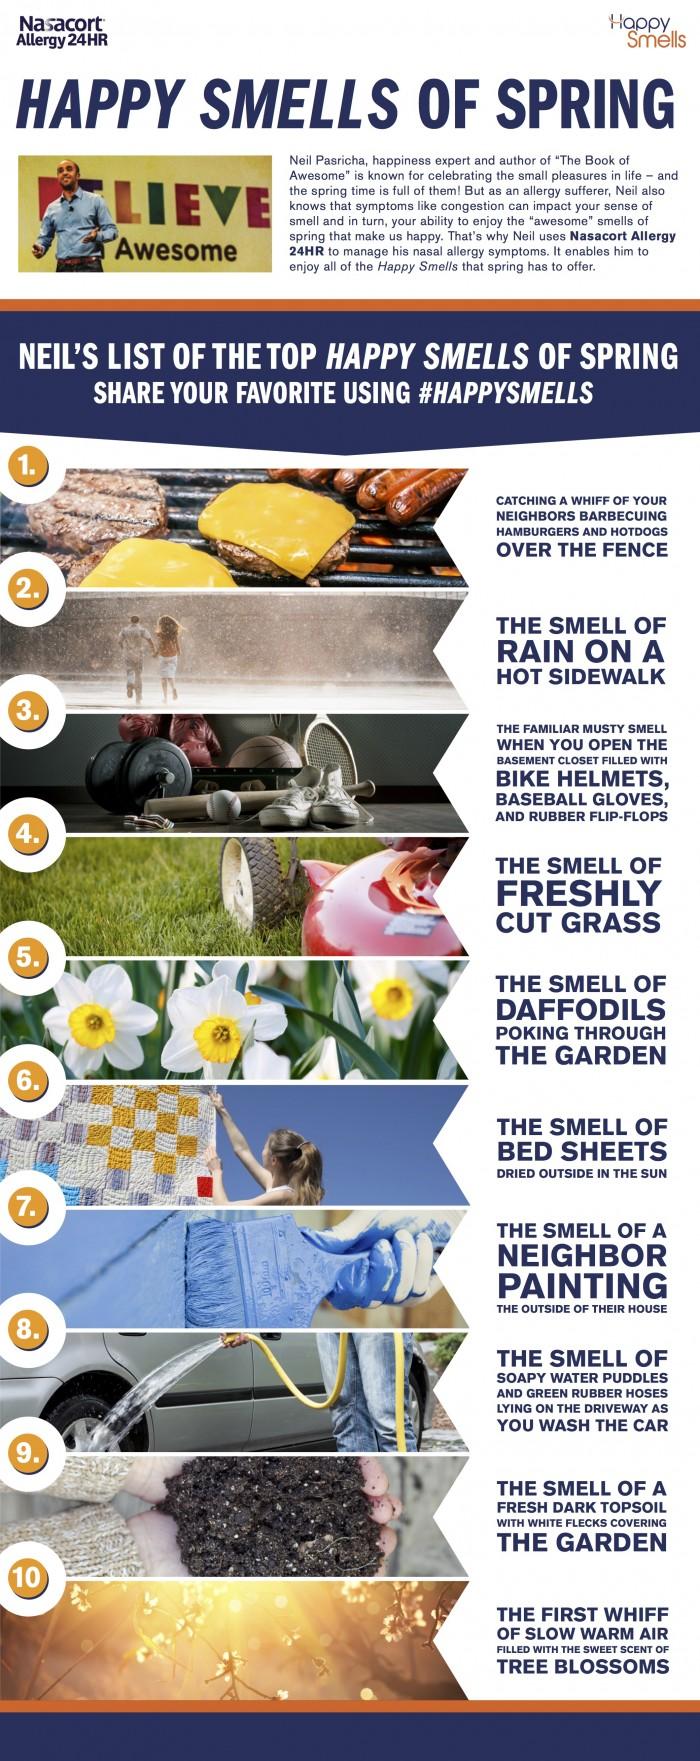 Nasacort Top Happy Smells of Spring